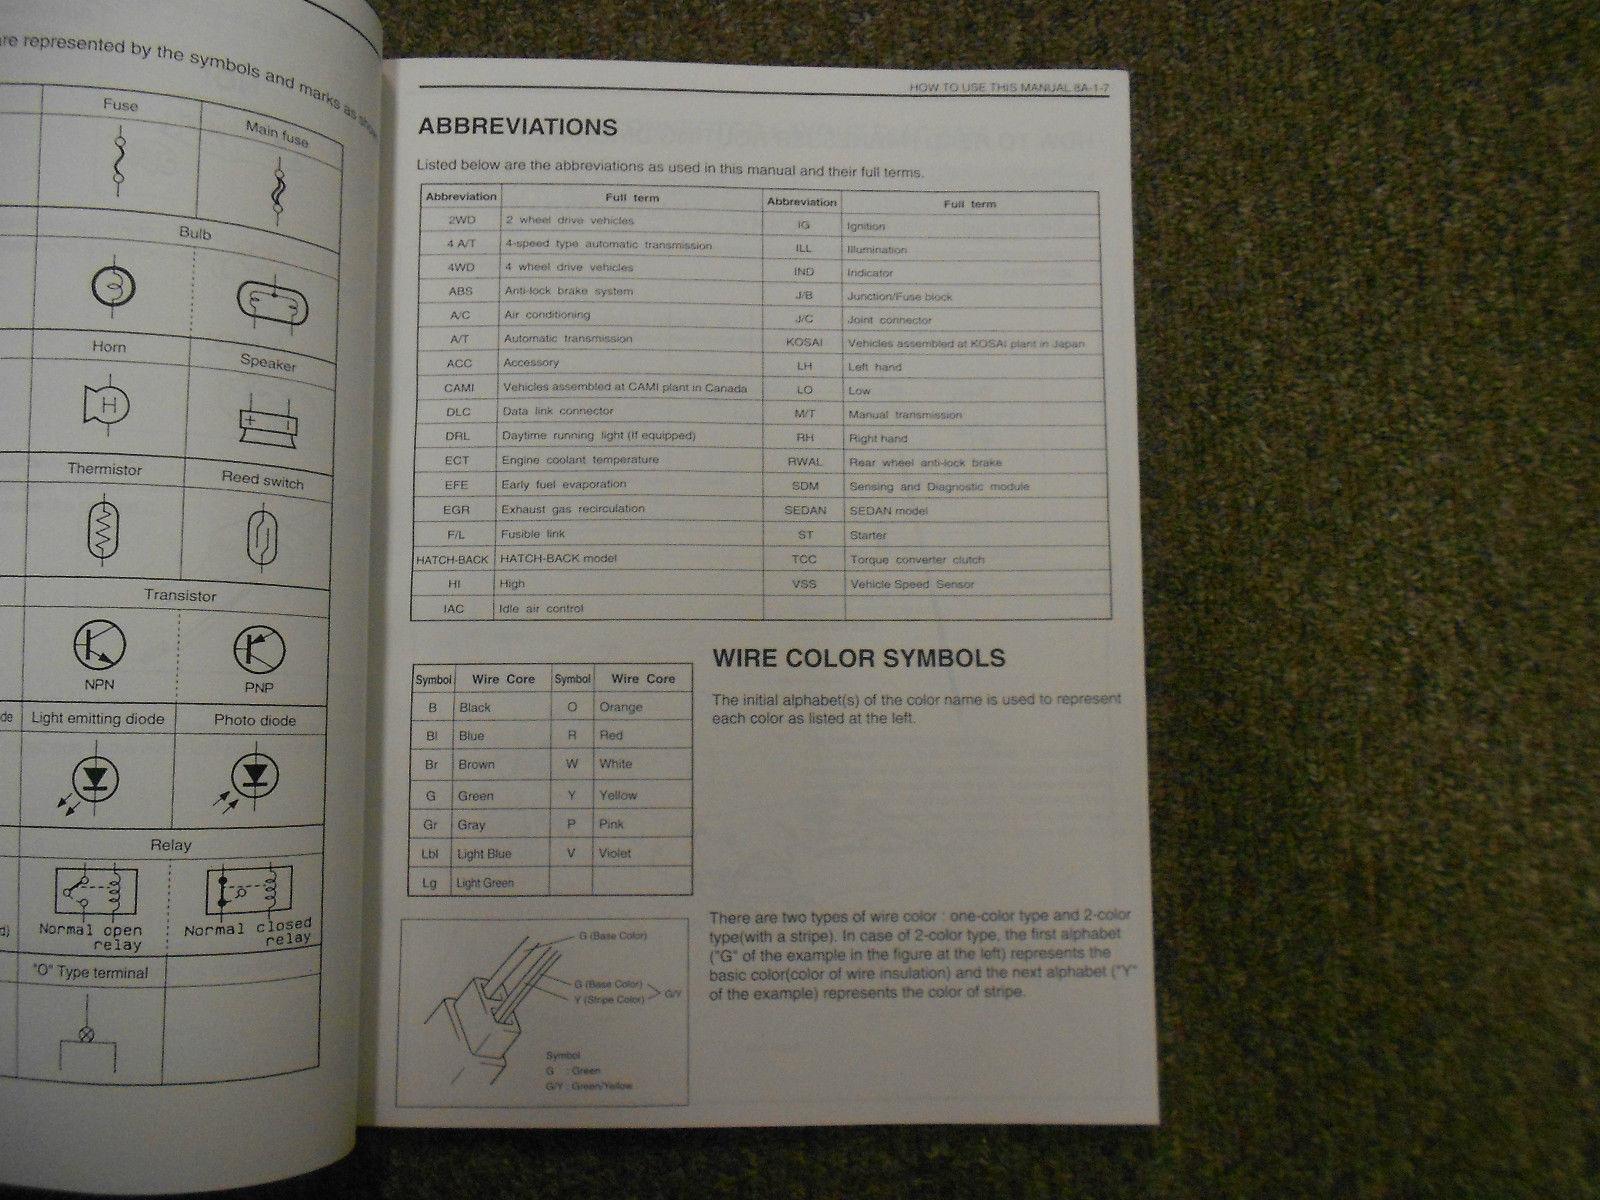 1995 Suzuki Esteem Wiring Diagram Shop Manual FACTORY OEM BOOK 95 2ND ED U.S VOL image 6